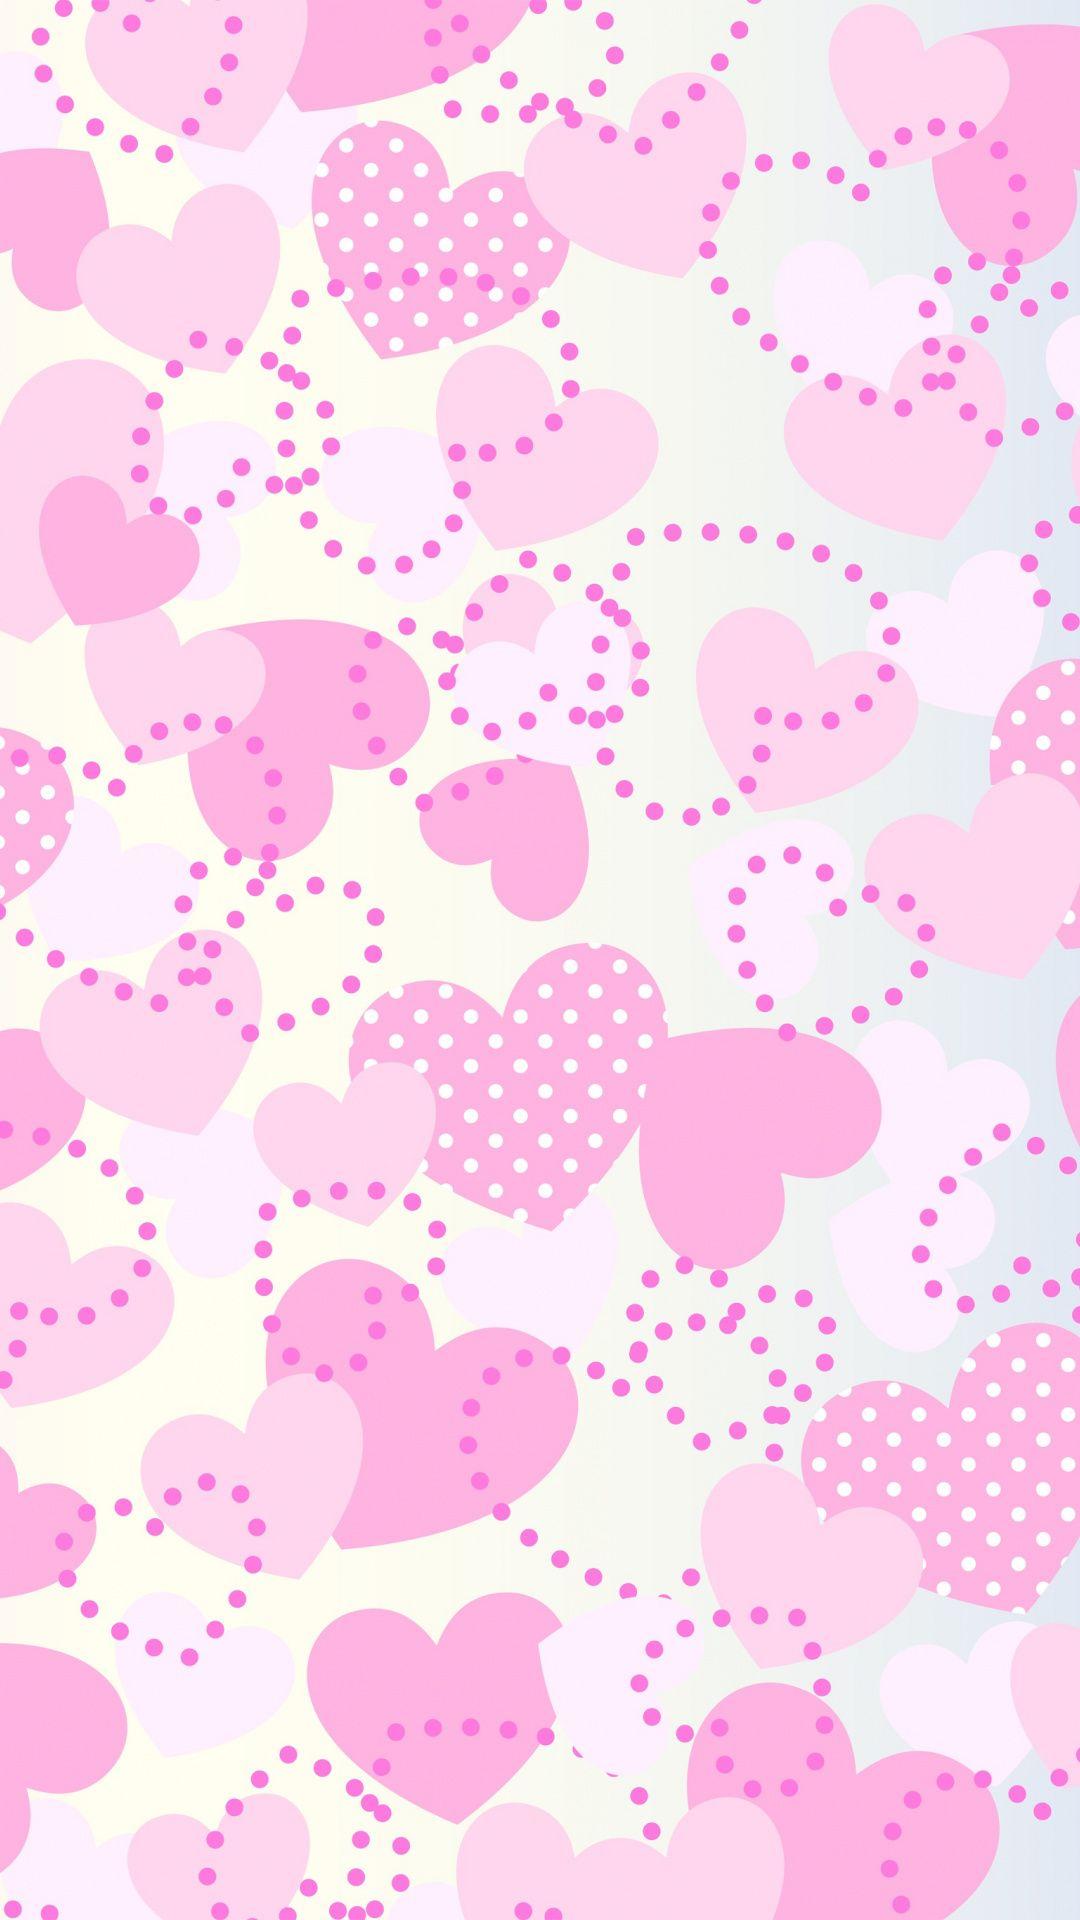 Pink Girly Hearts Abstract Wallpaper Abstract Wallpaper Heart Wallpaper Wallpaper